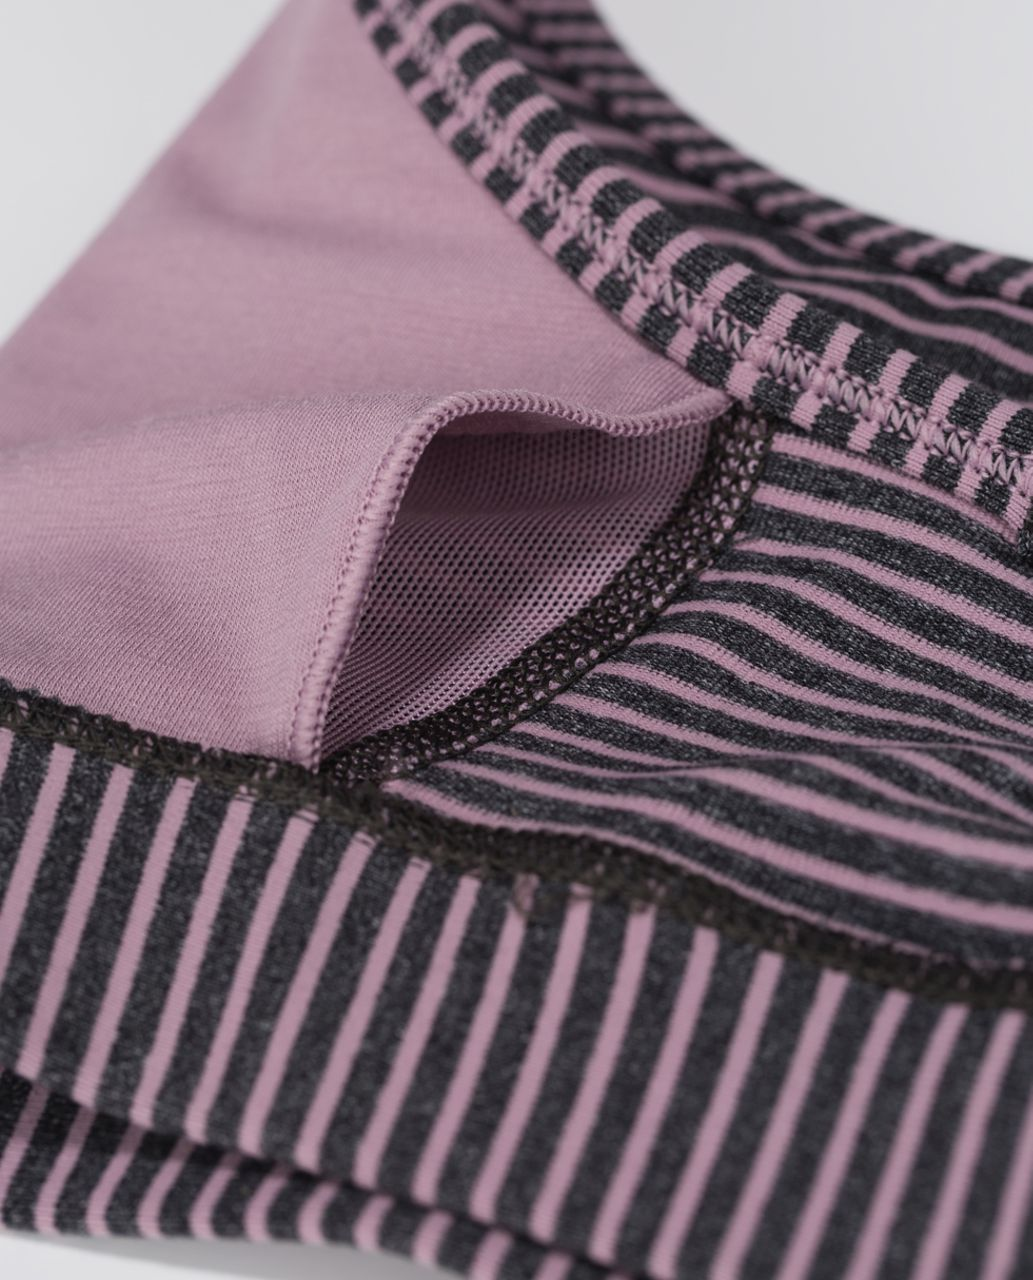 Lululemon Flow Y Bra IV - Hyper Stripe Mauvelous Heathered Black